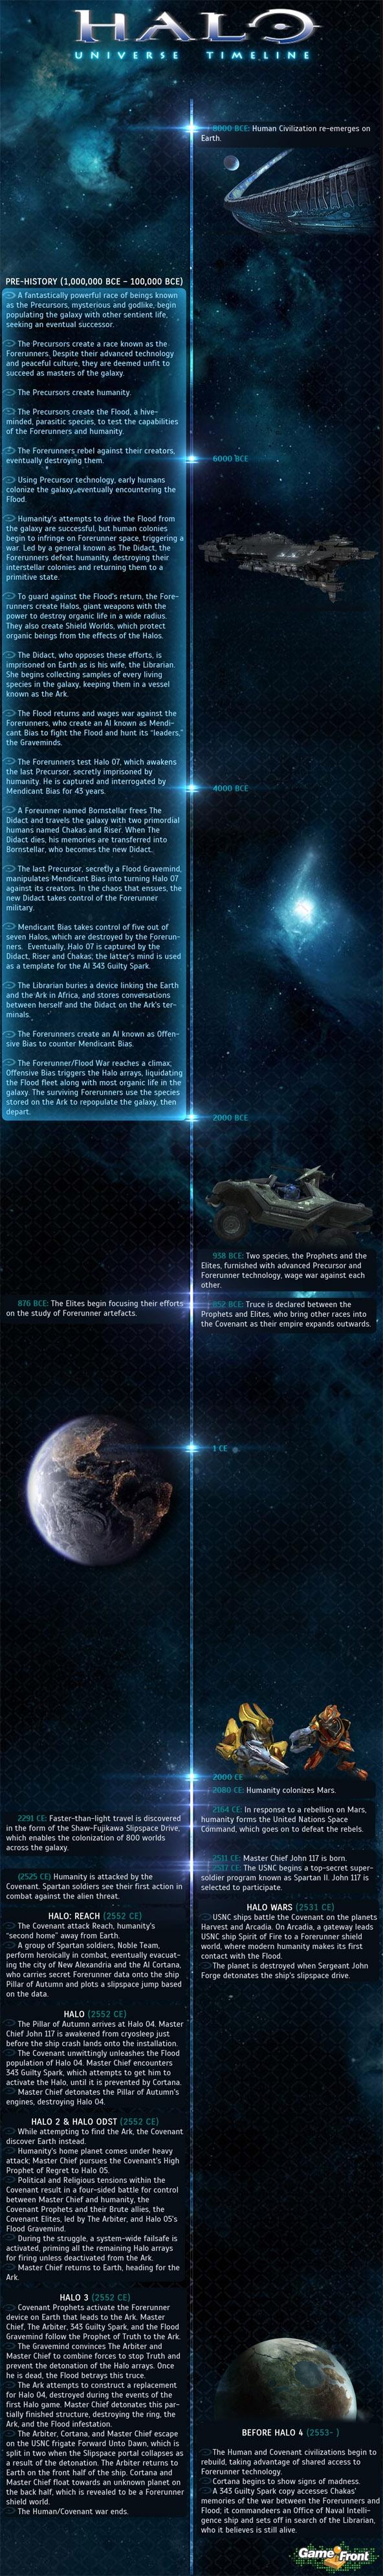 Halo Time line